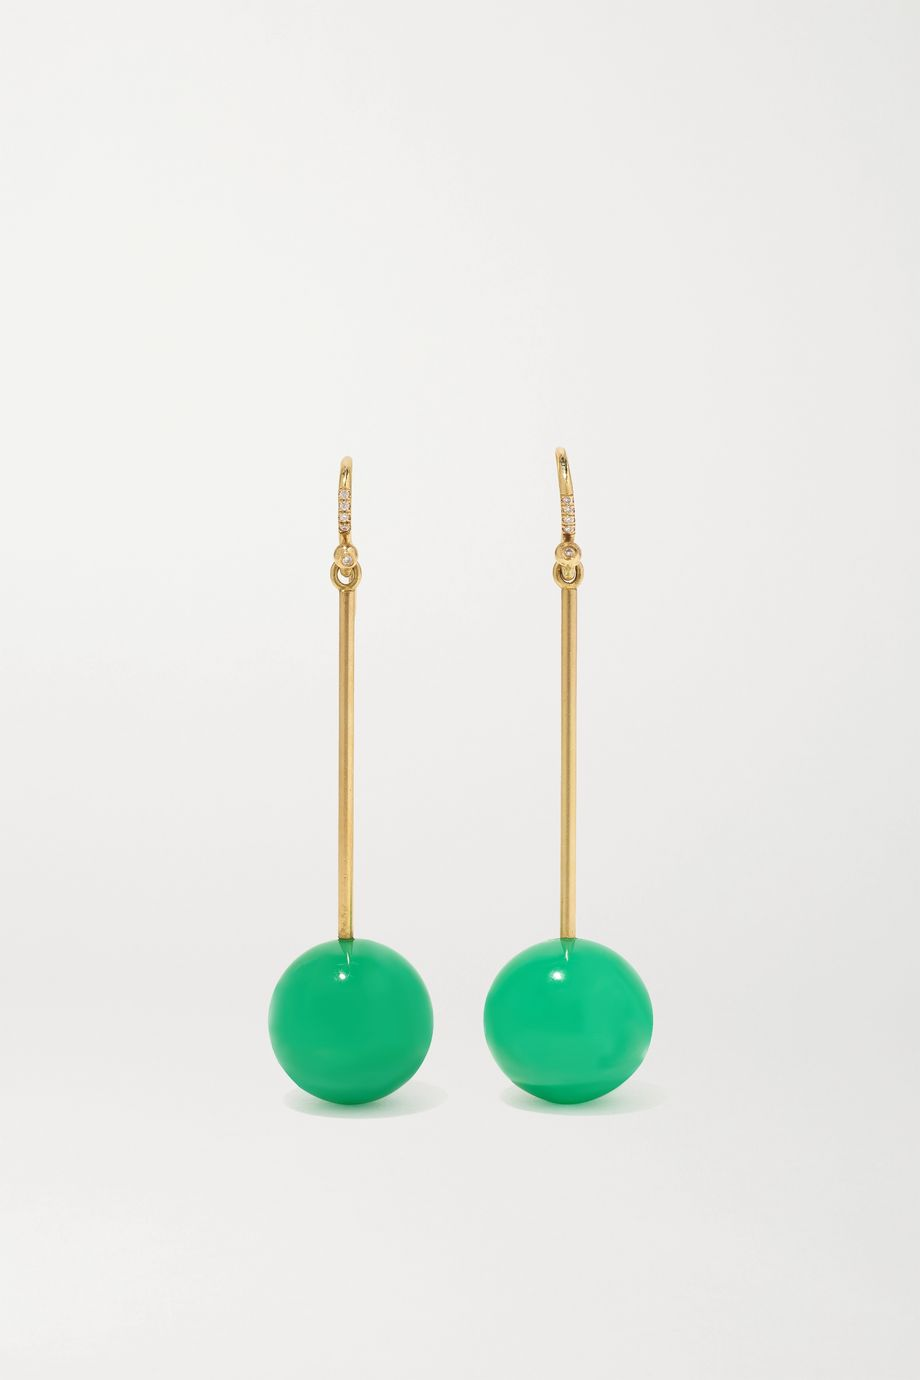 Irene Neuwirth Gumball 18-karat gold, chrysoprase and diamond earrings